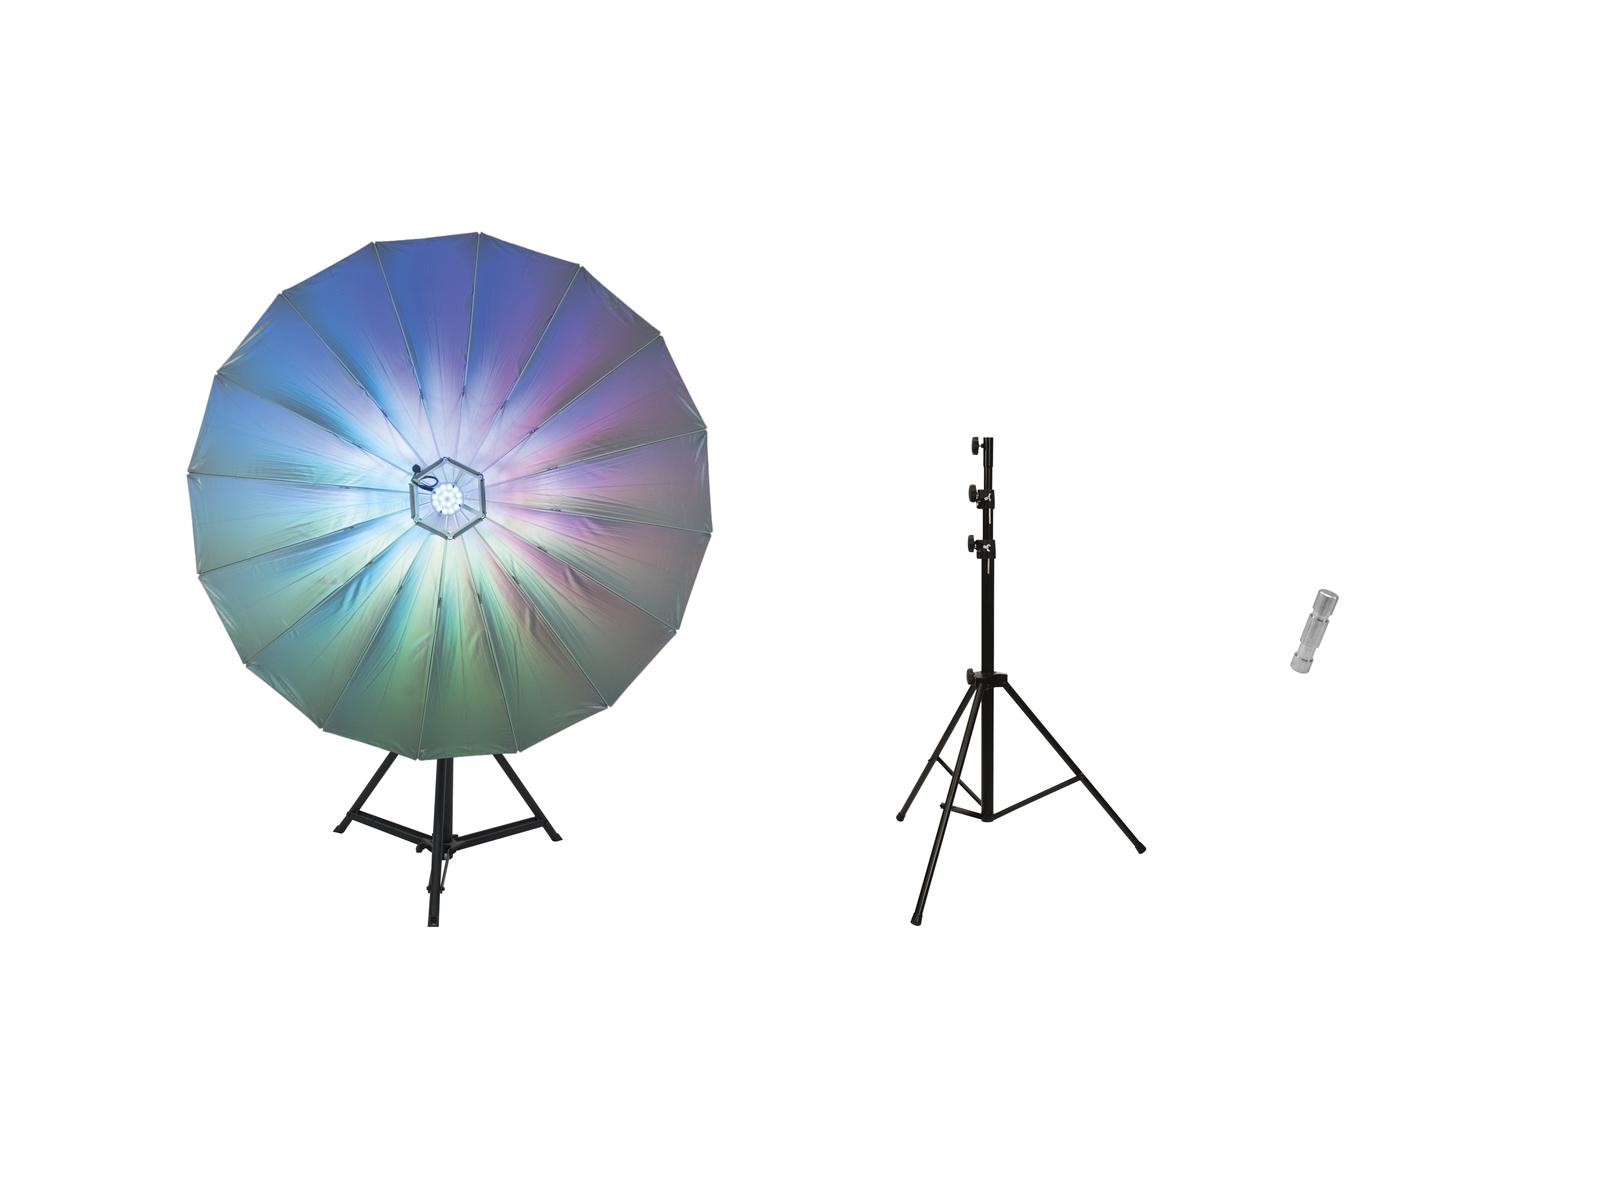 eurolite-set-led-umbrella-140-stv-50-wot